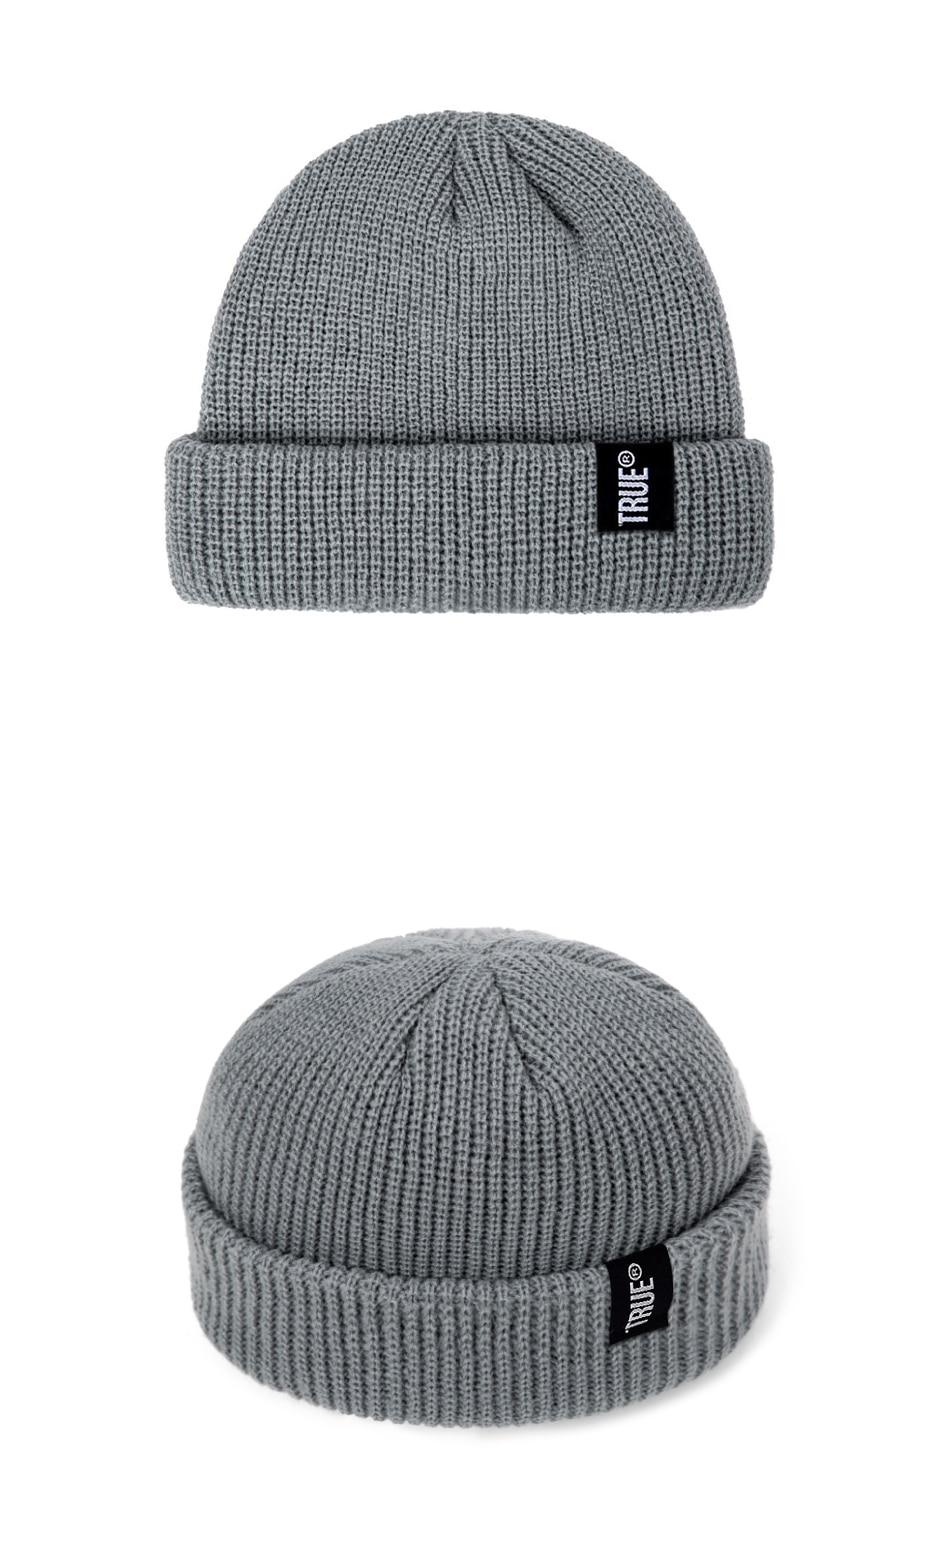 2019 Fashion Unisex Winter Hat Men Cuffed Cib Knit Hat Short Melon Ski Beanies Autumn Winter Solid Color Casual Beanie Hat 32